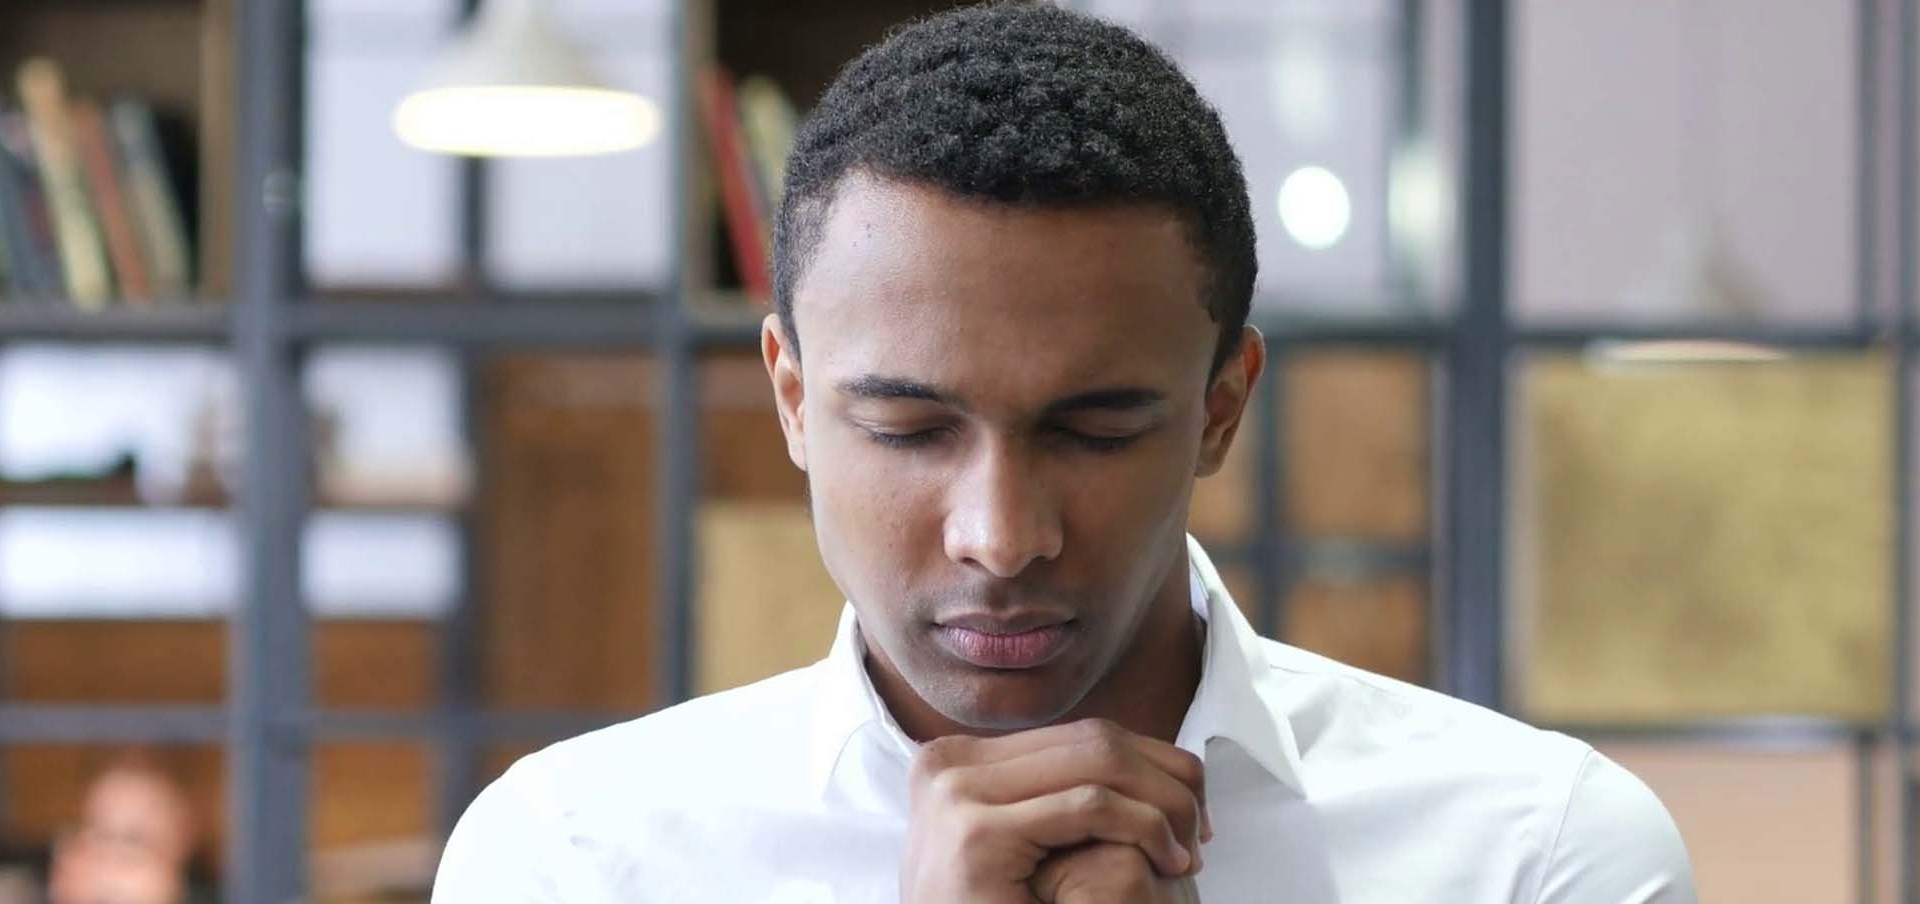 Two Key Ways Dedicated Entrepreneurs Distinguish Themselves